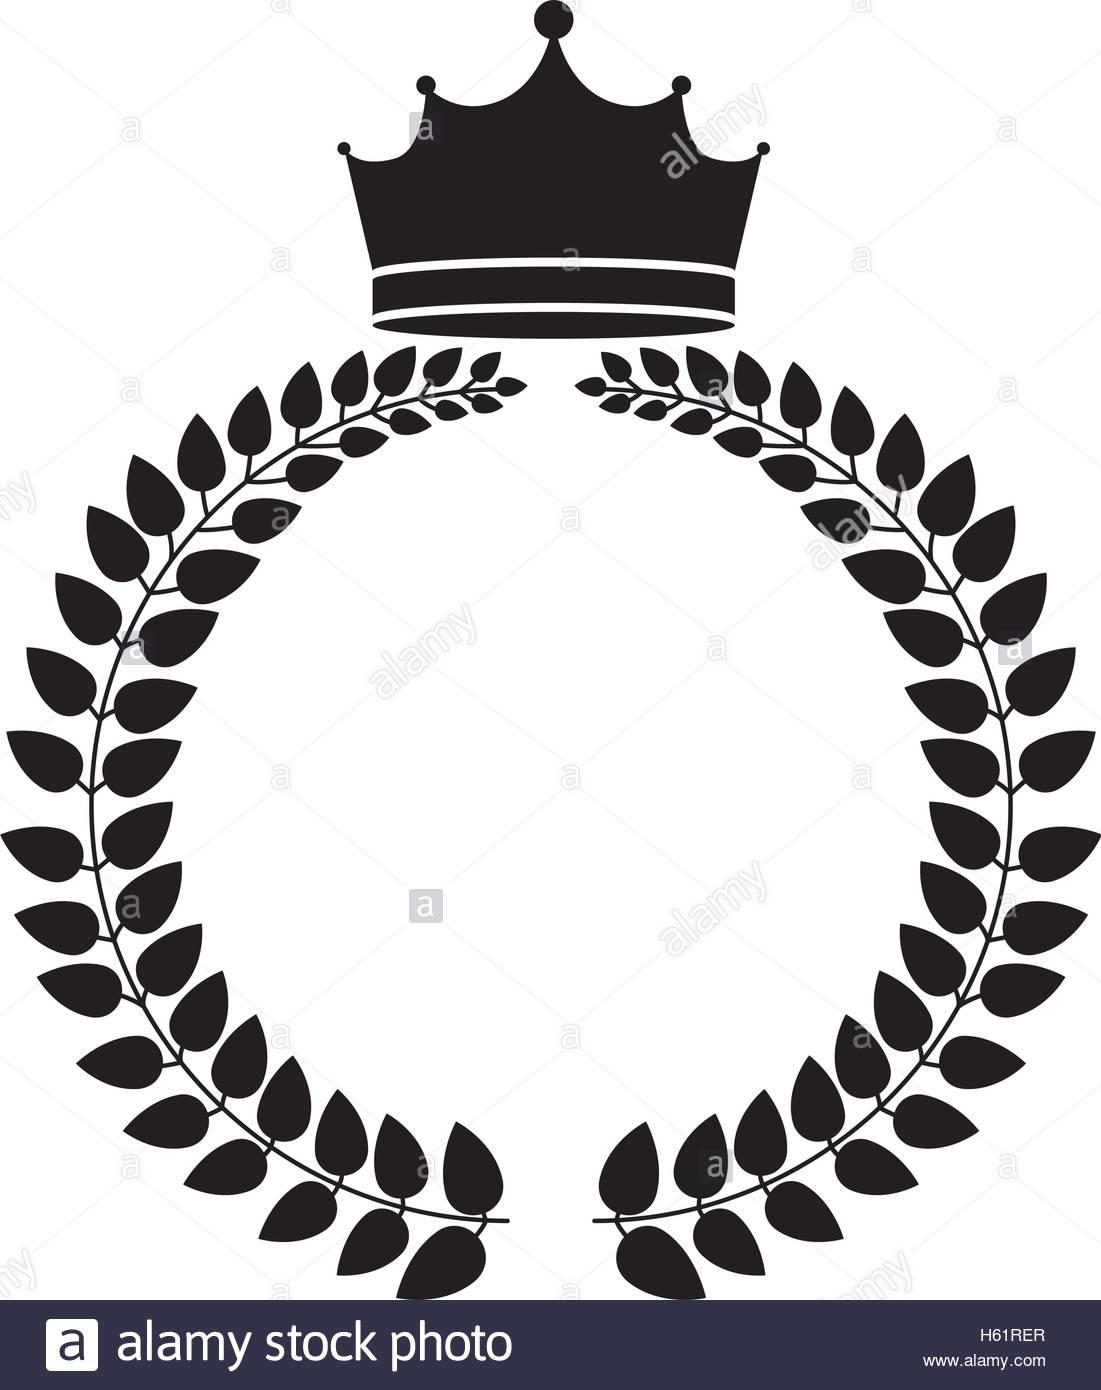 1101x1390 Coronation Stock Vector Images